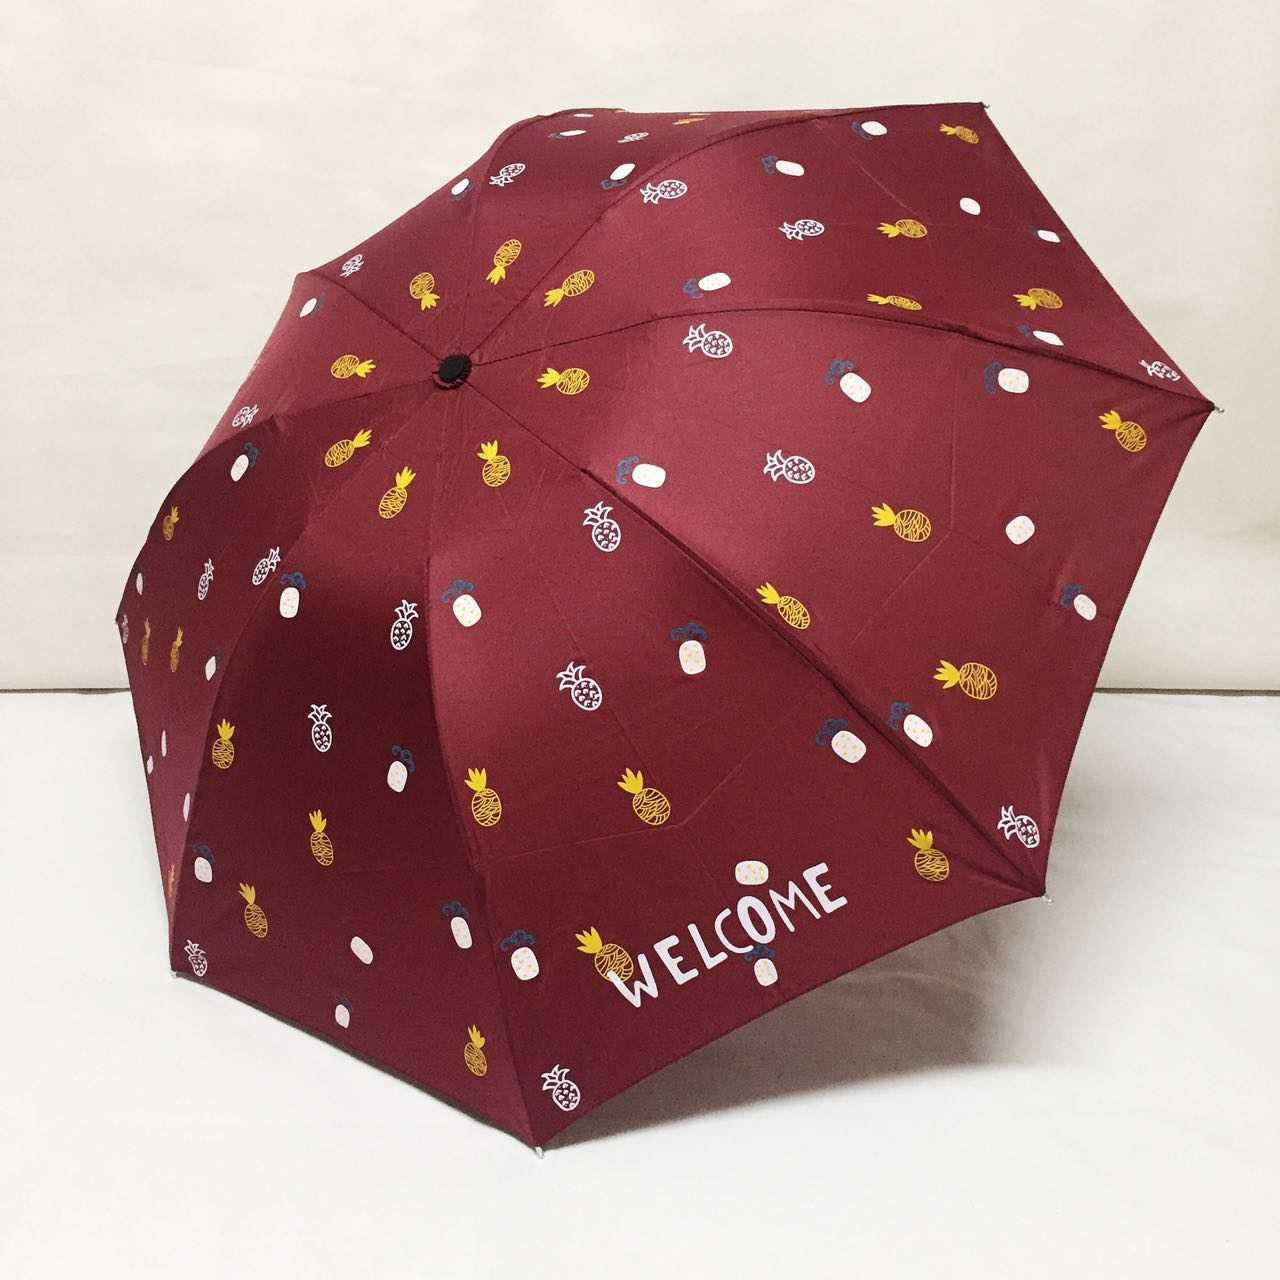 Payung lipat 3 pinapple welcome - 5971